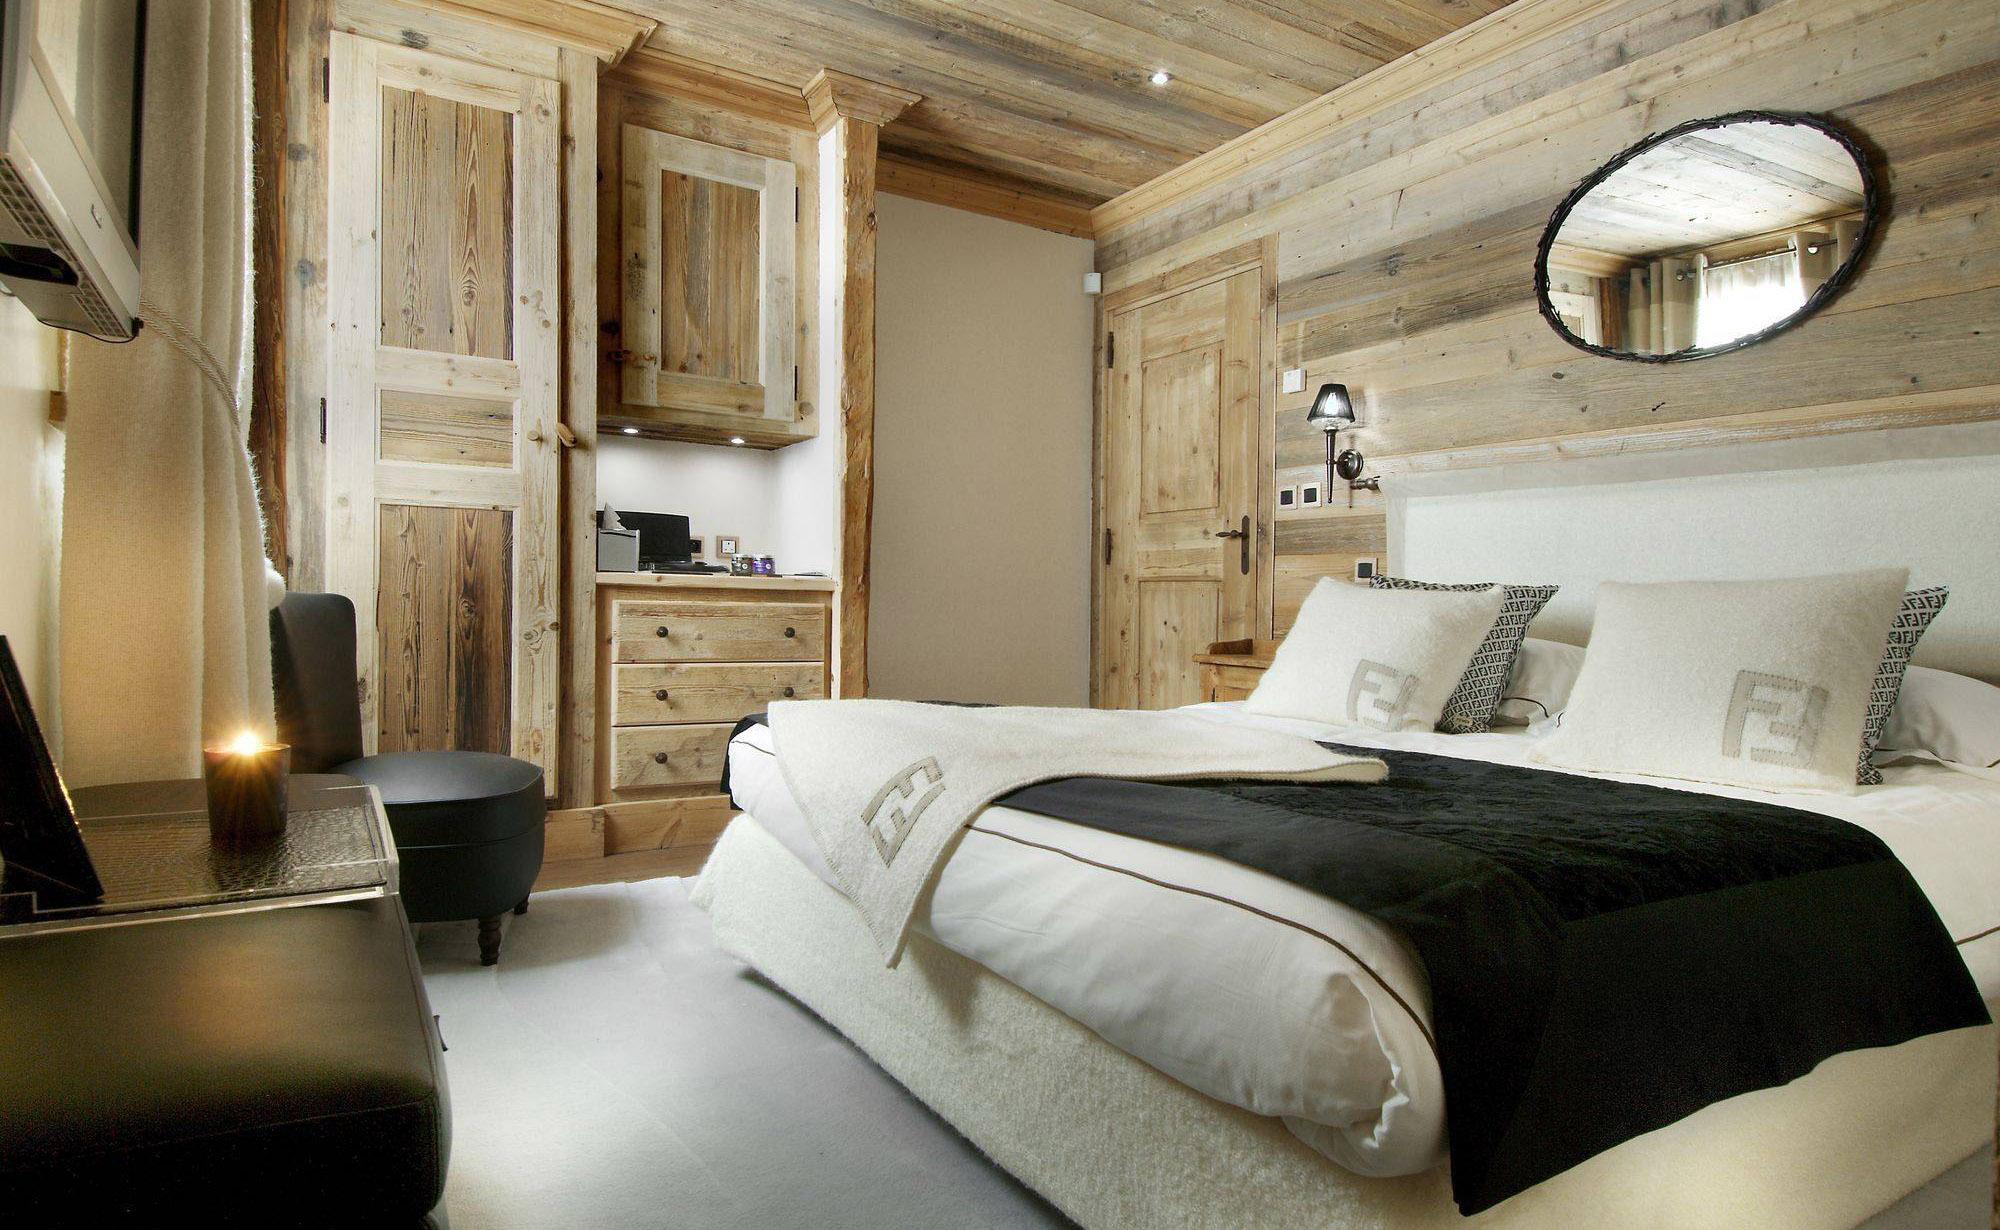 Lovelydays luxury service apartment rental - Courchevel - Great Roc Chalet - Partner - 7 bedrooms - 6 bathrooms - King bed - 117d51728700 - Lovelydays